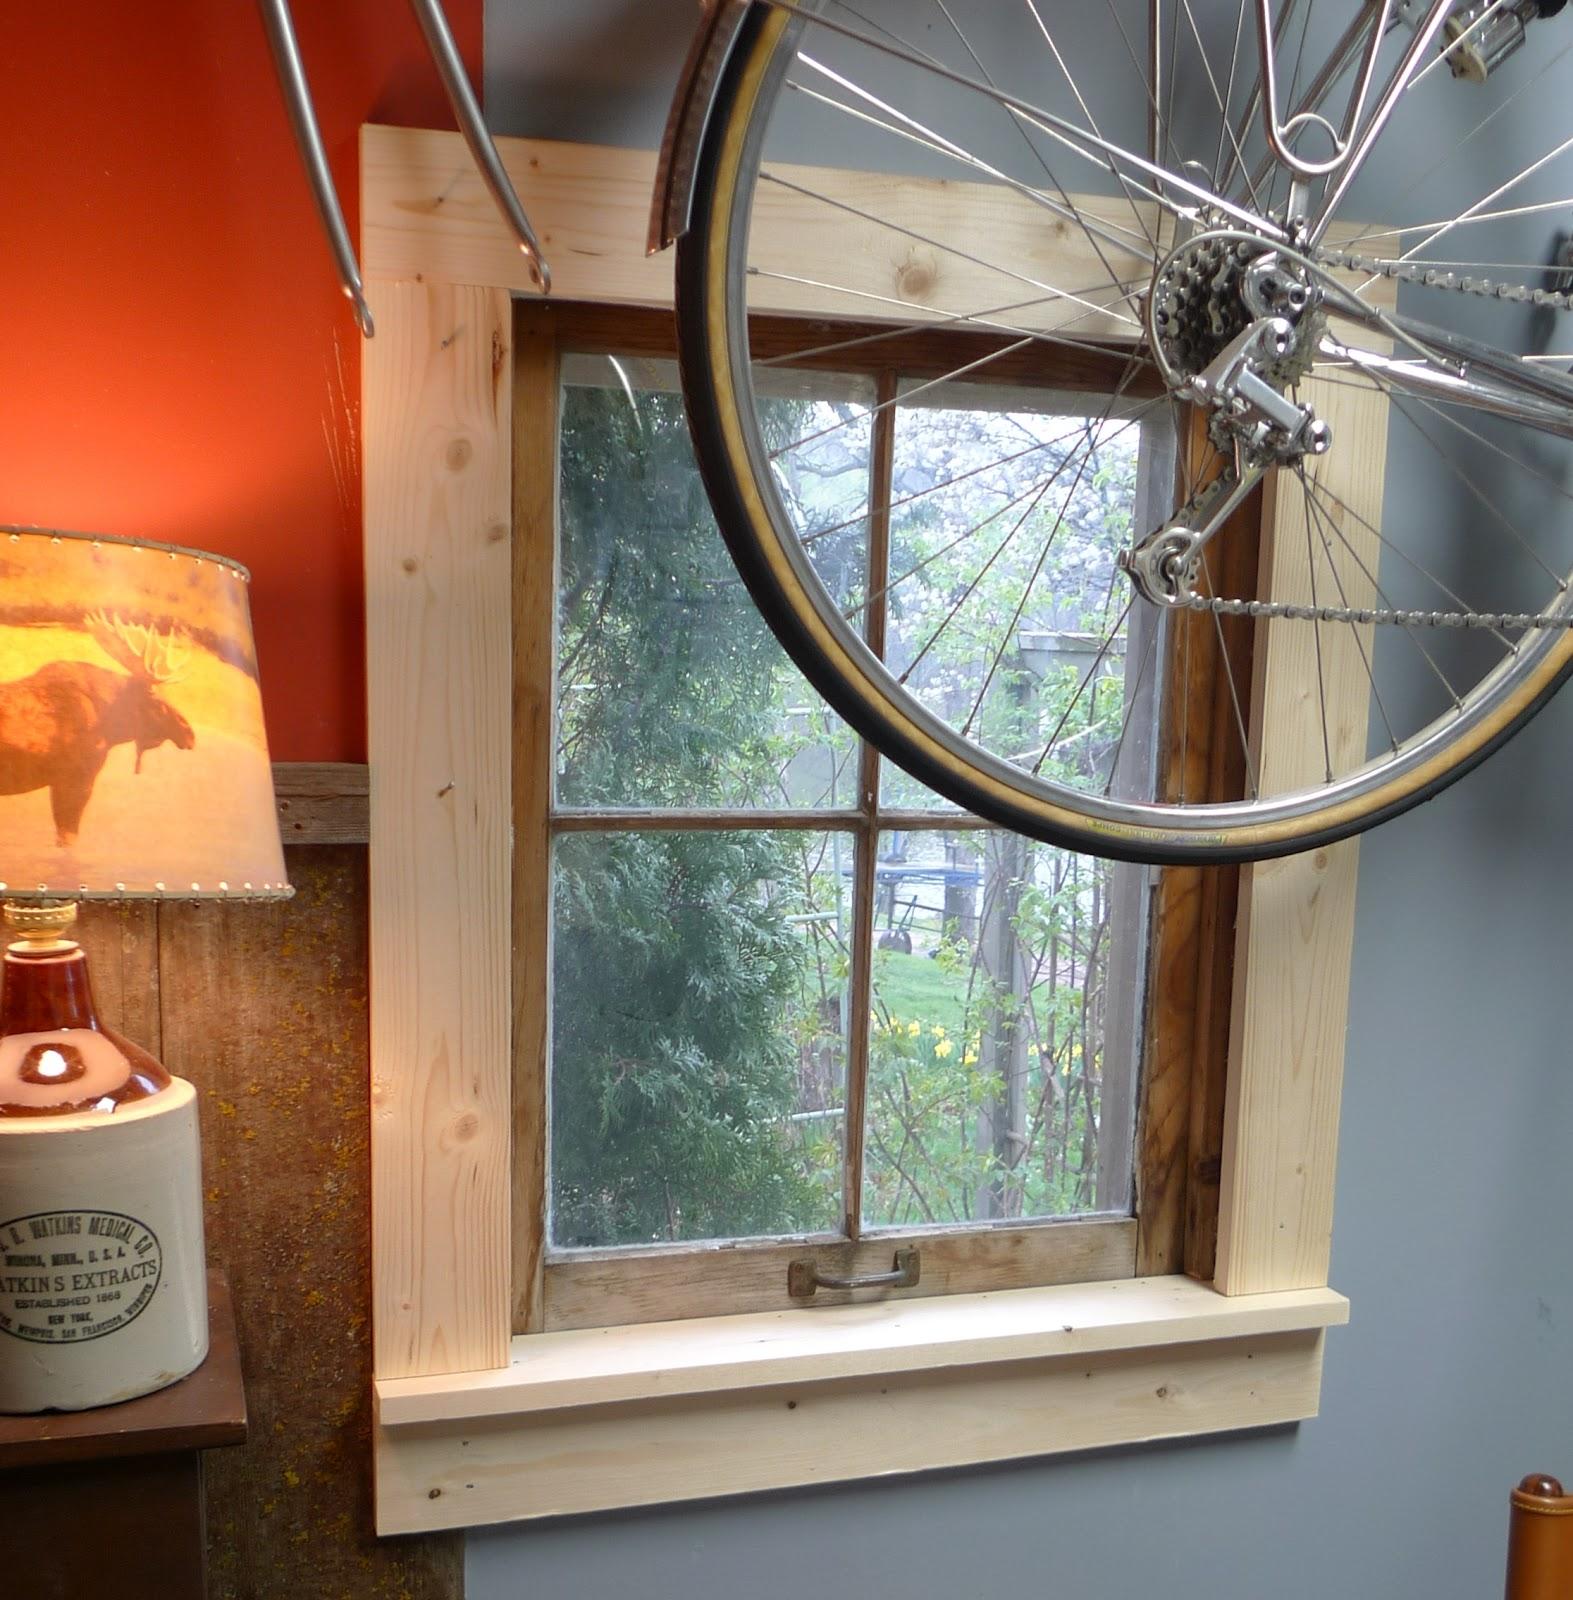 1410 OakWooD: Window Framing and Knee Nailing